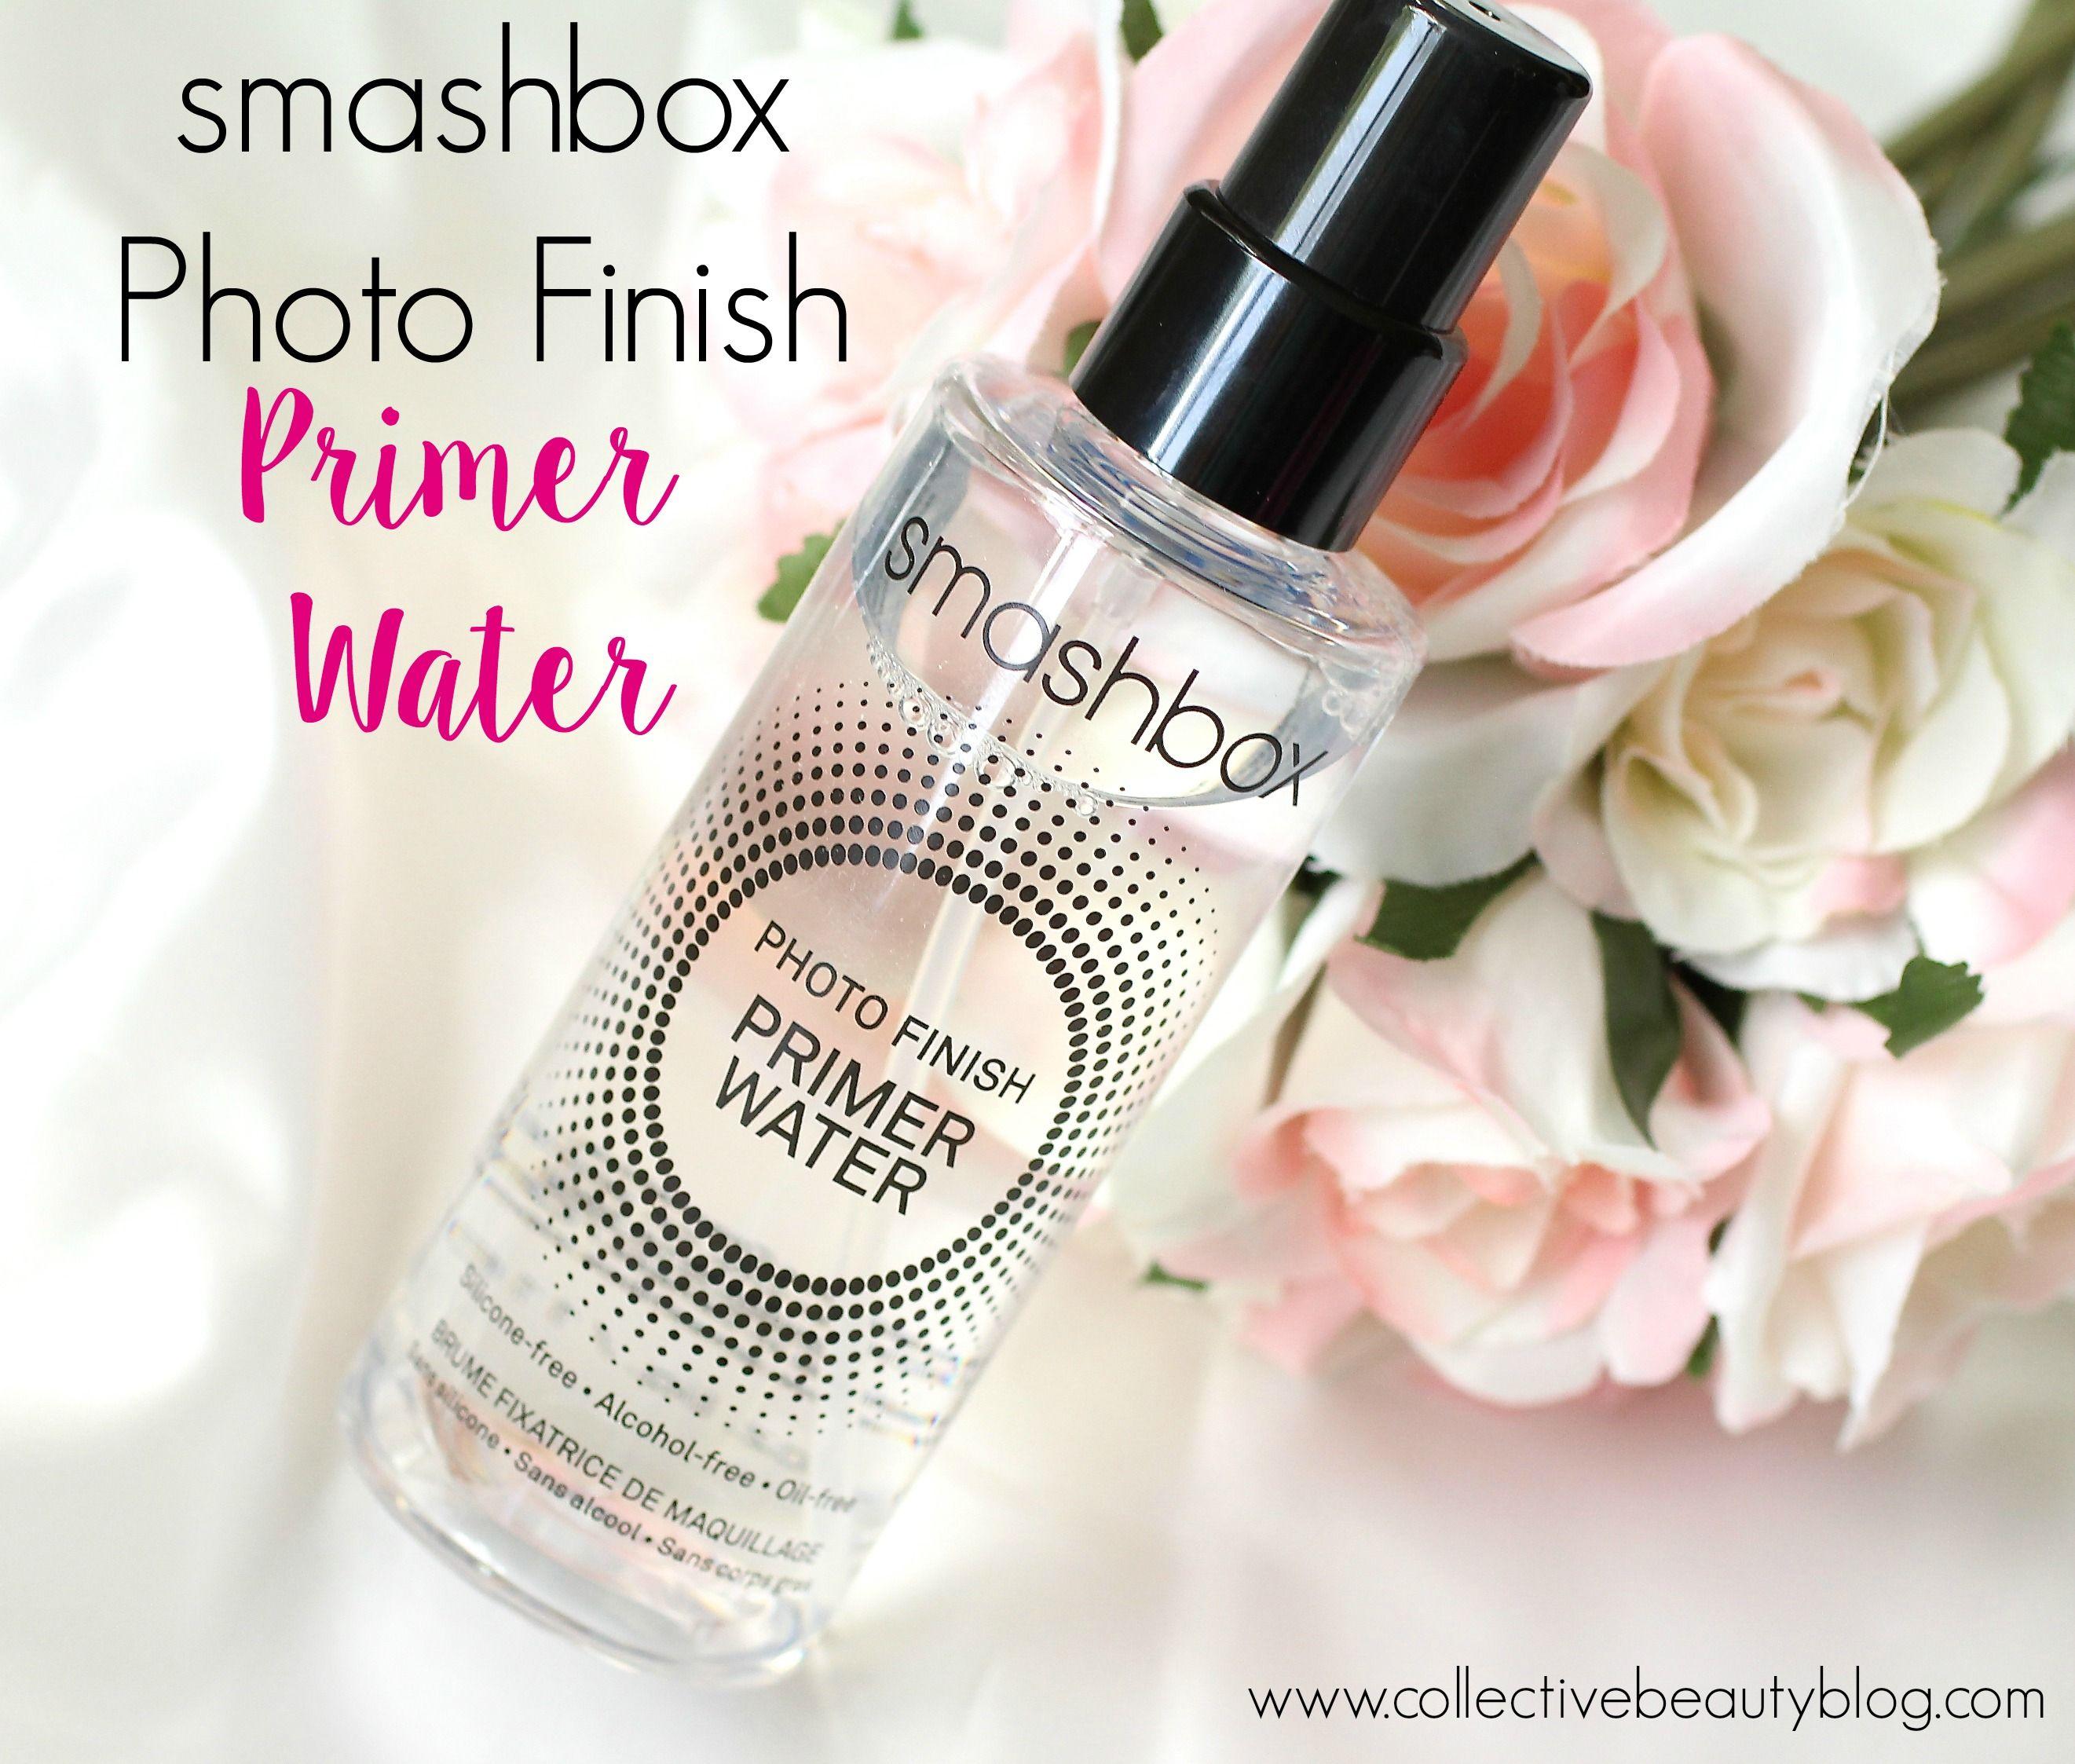 Photo Finish Foundation Primer Water by Smashbox #19